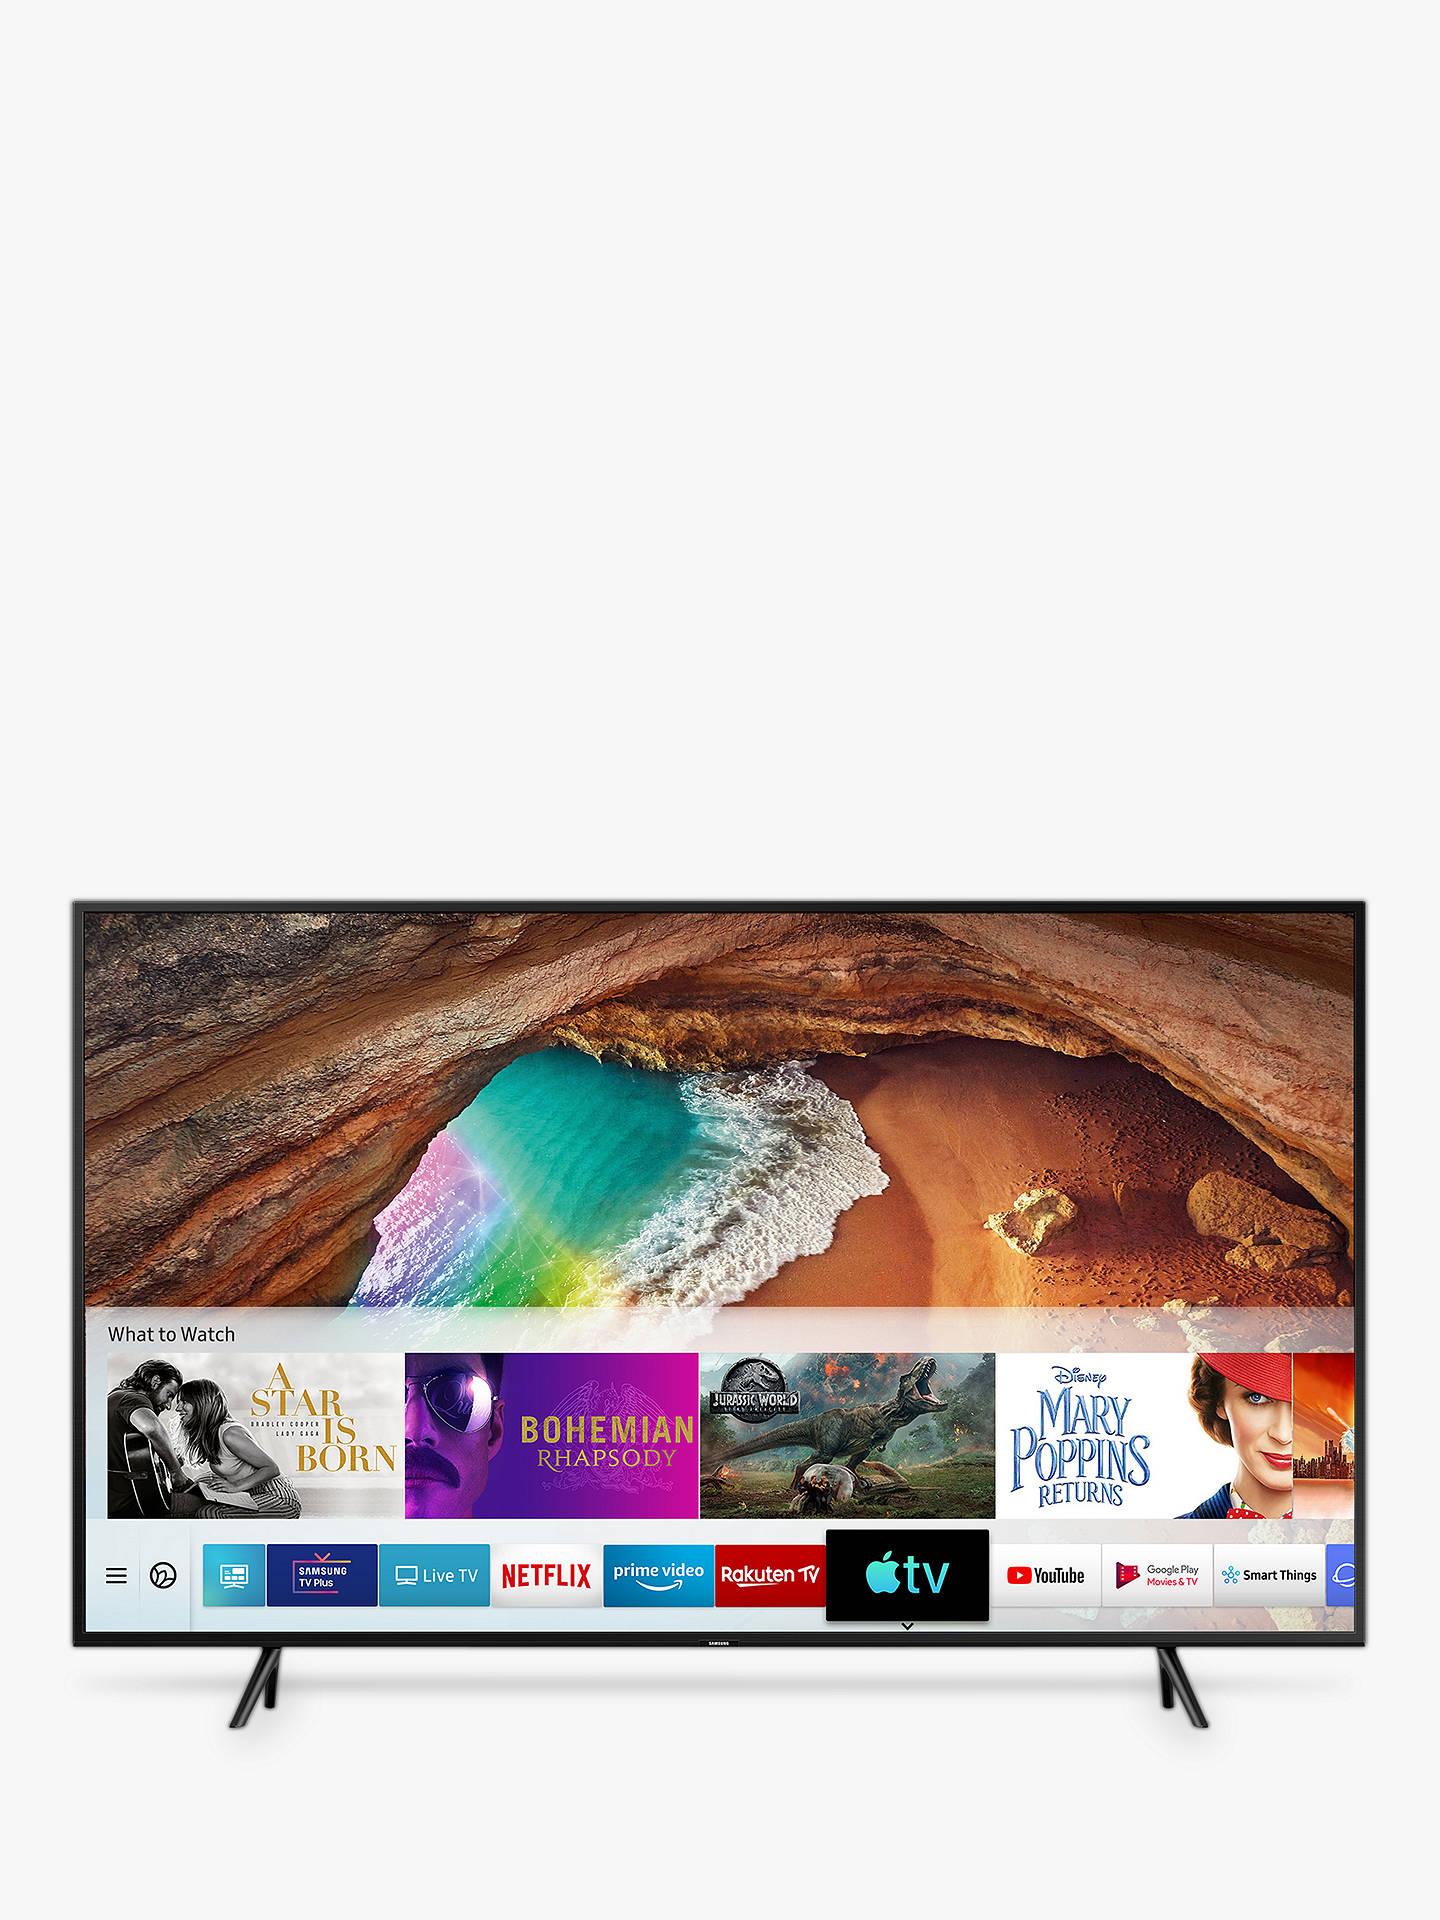 Samsung QE82Q60R QLED HDR 4K Smart TV £1,850 @ John Lewis & Partners Aberdeen